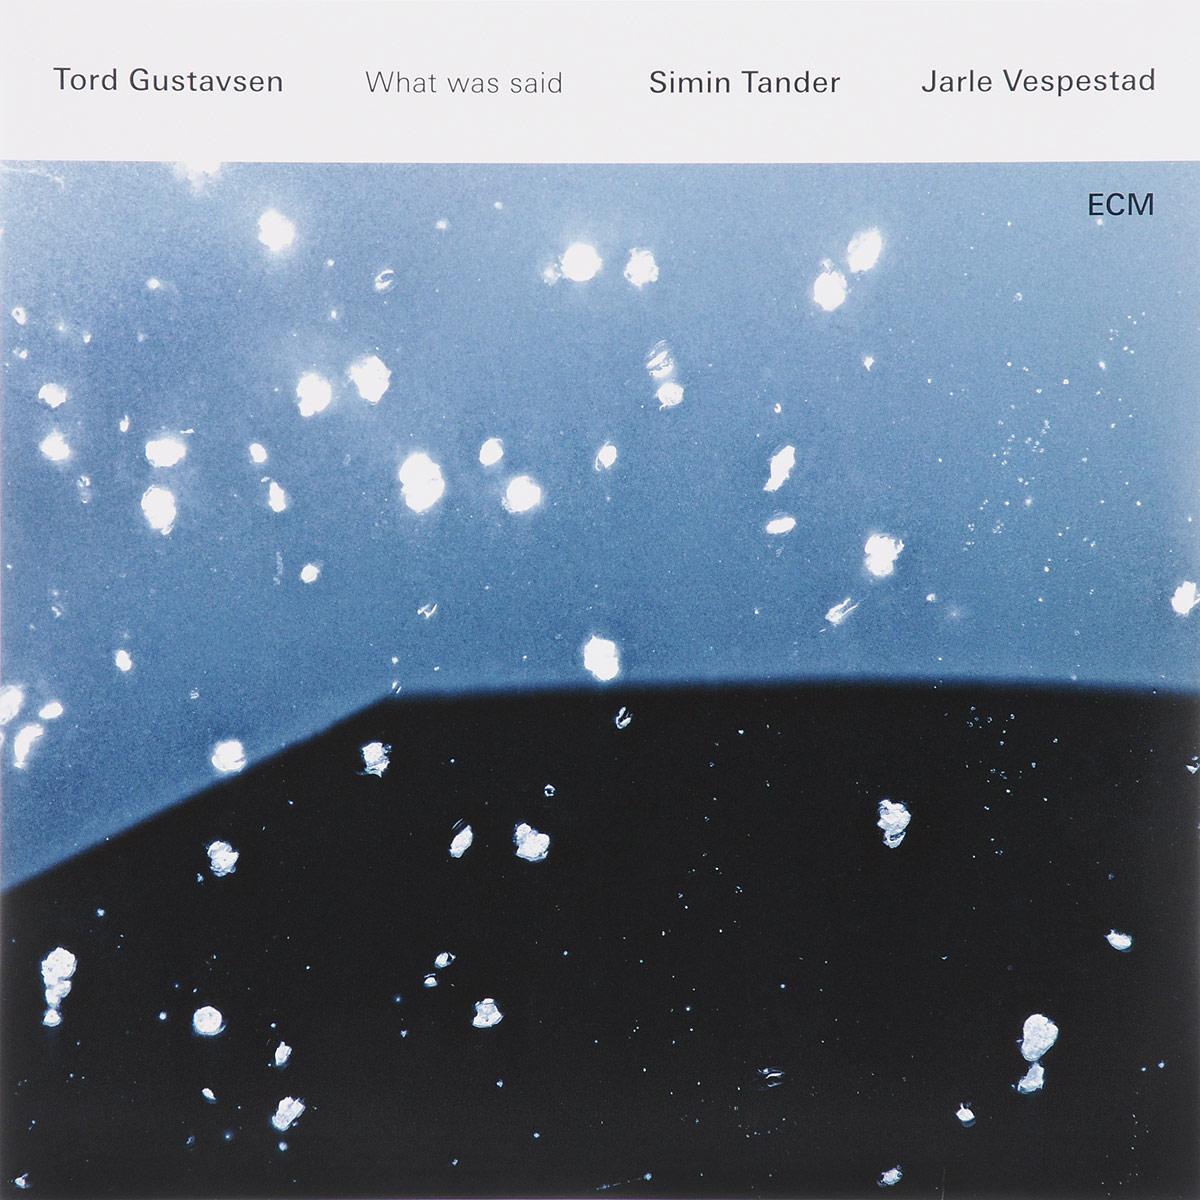 лучшая цена Tord Gustavsen,Simin Tander,Jarle Vespestad Tord Gustavsen, Simin Tander, Jarle Vespestad. What Was Said (2 LP)